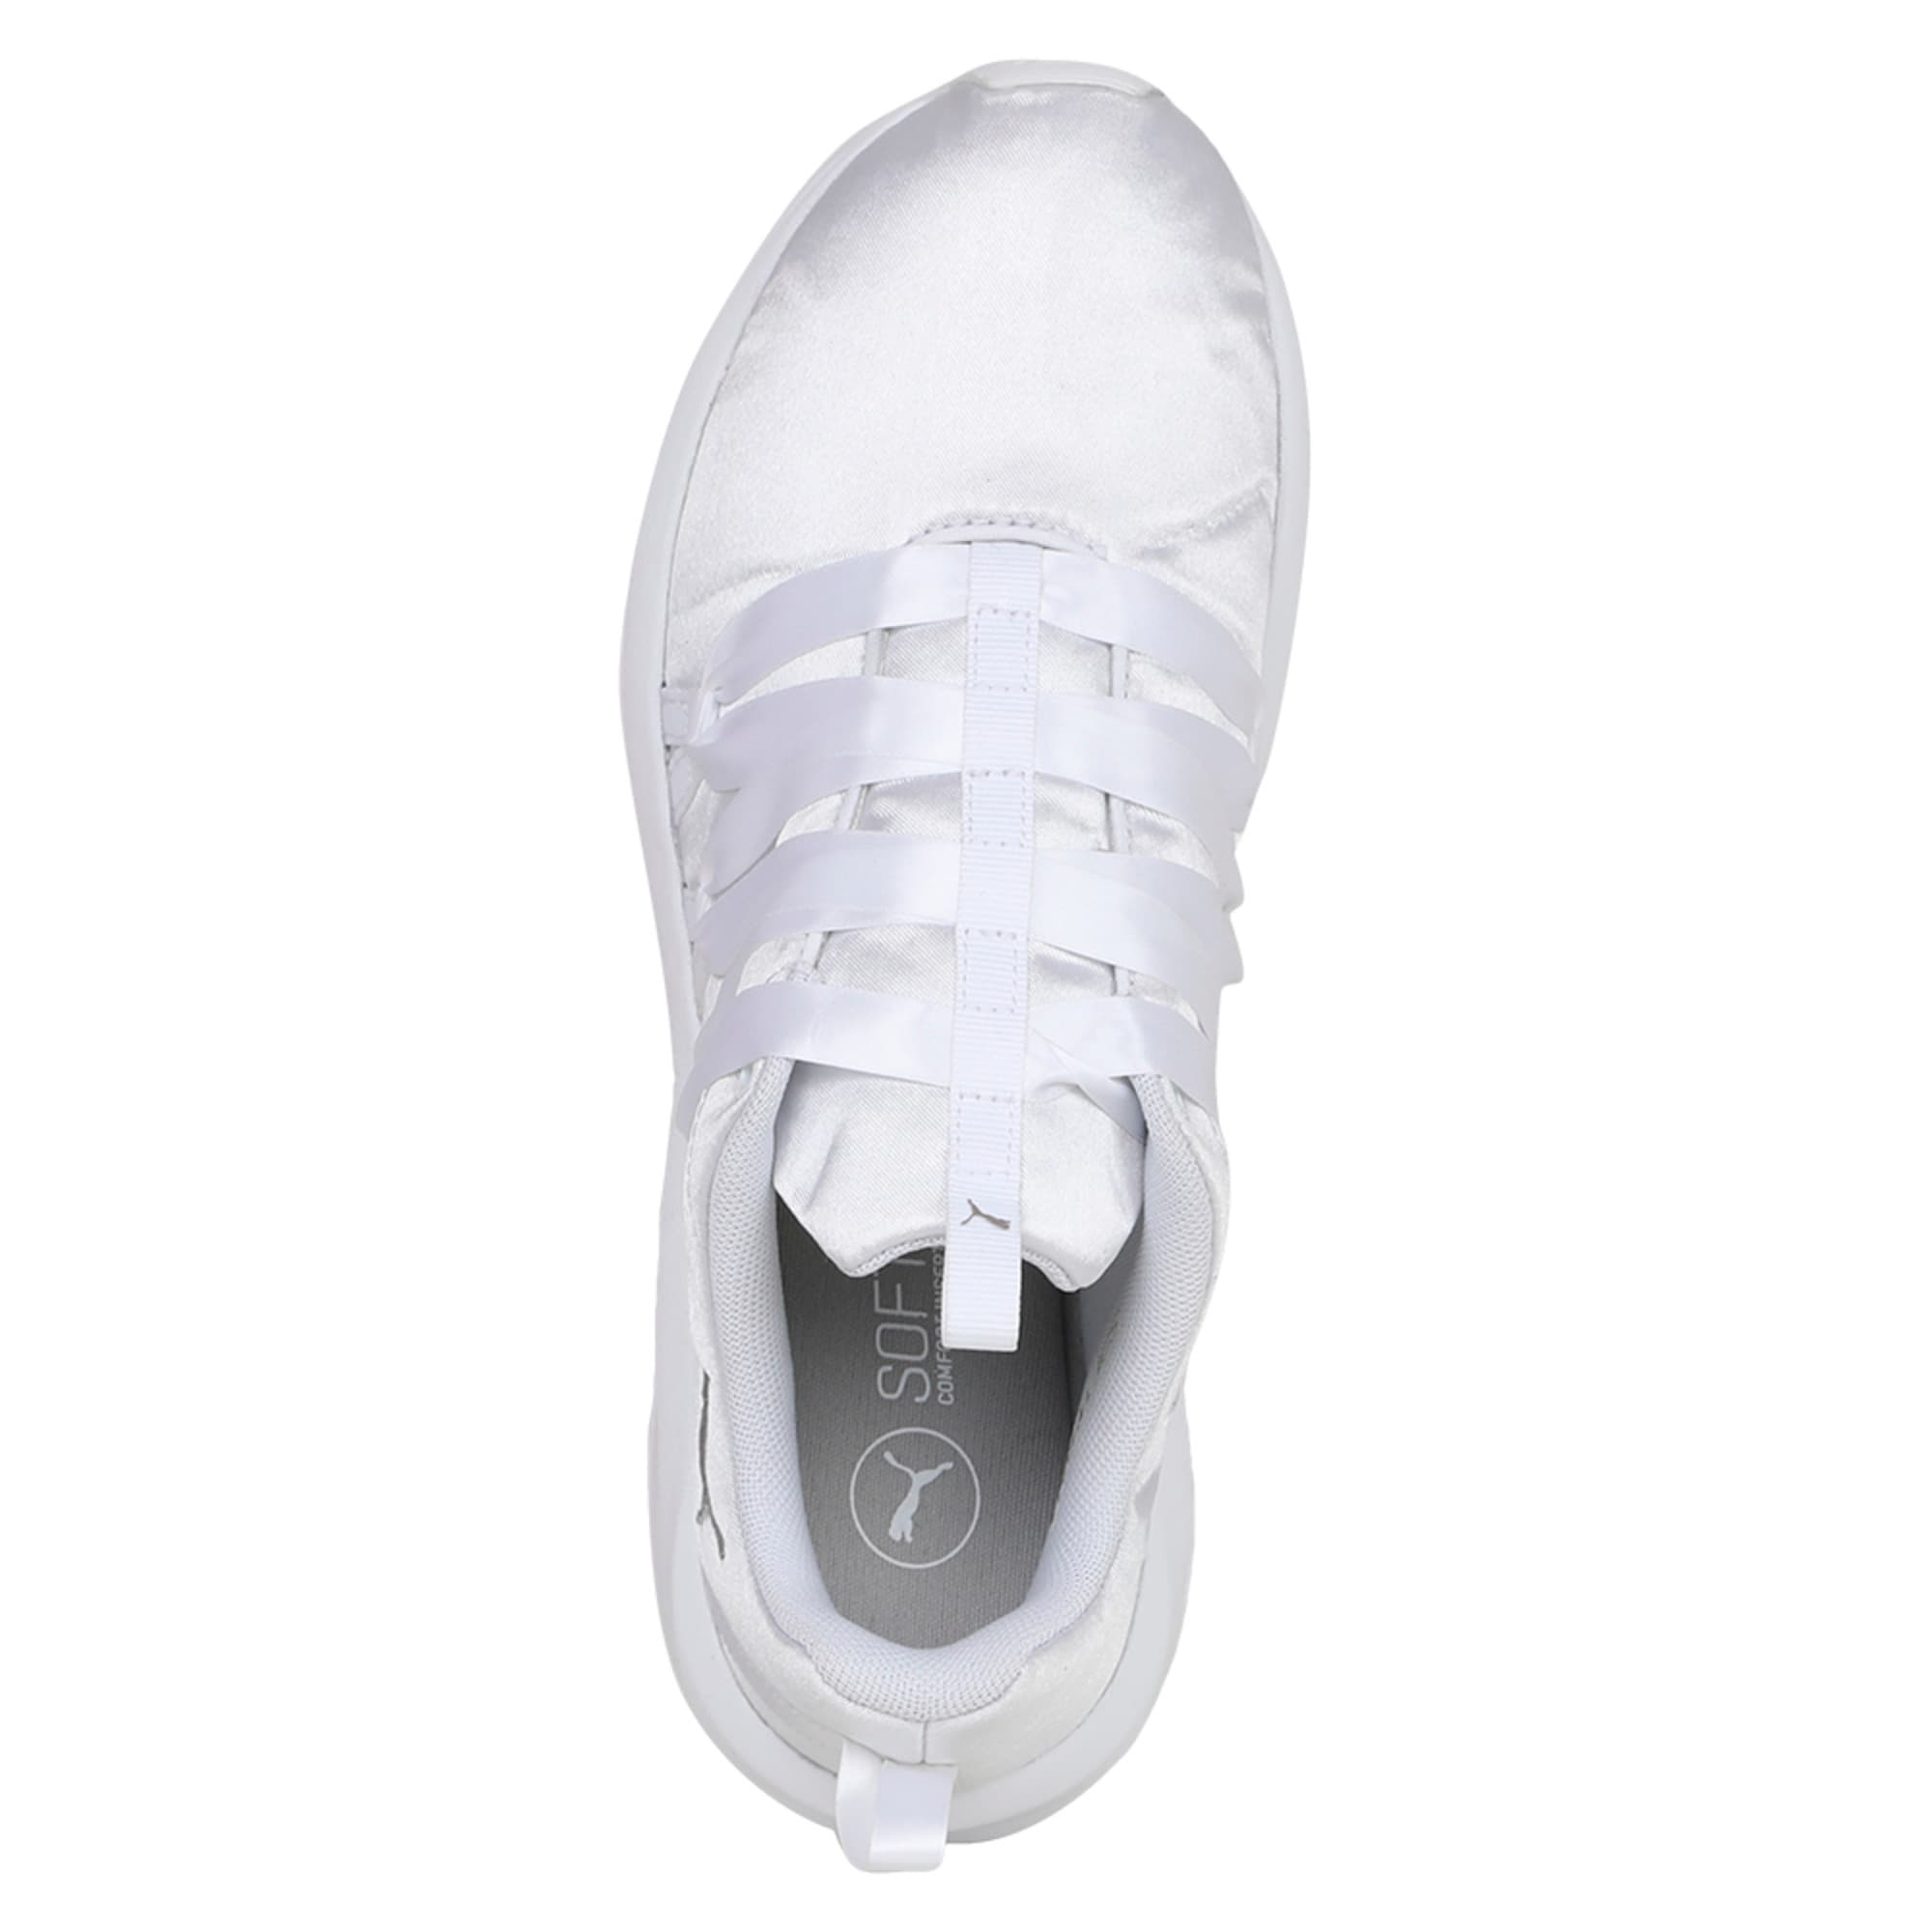 Thumbnail 3 of Prowl Alt Satin Women's Training Shoes, Puma White, medium-IND